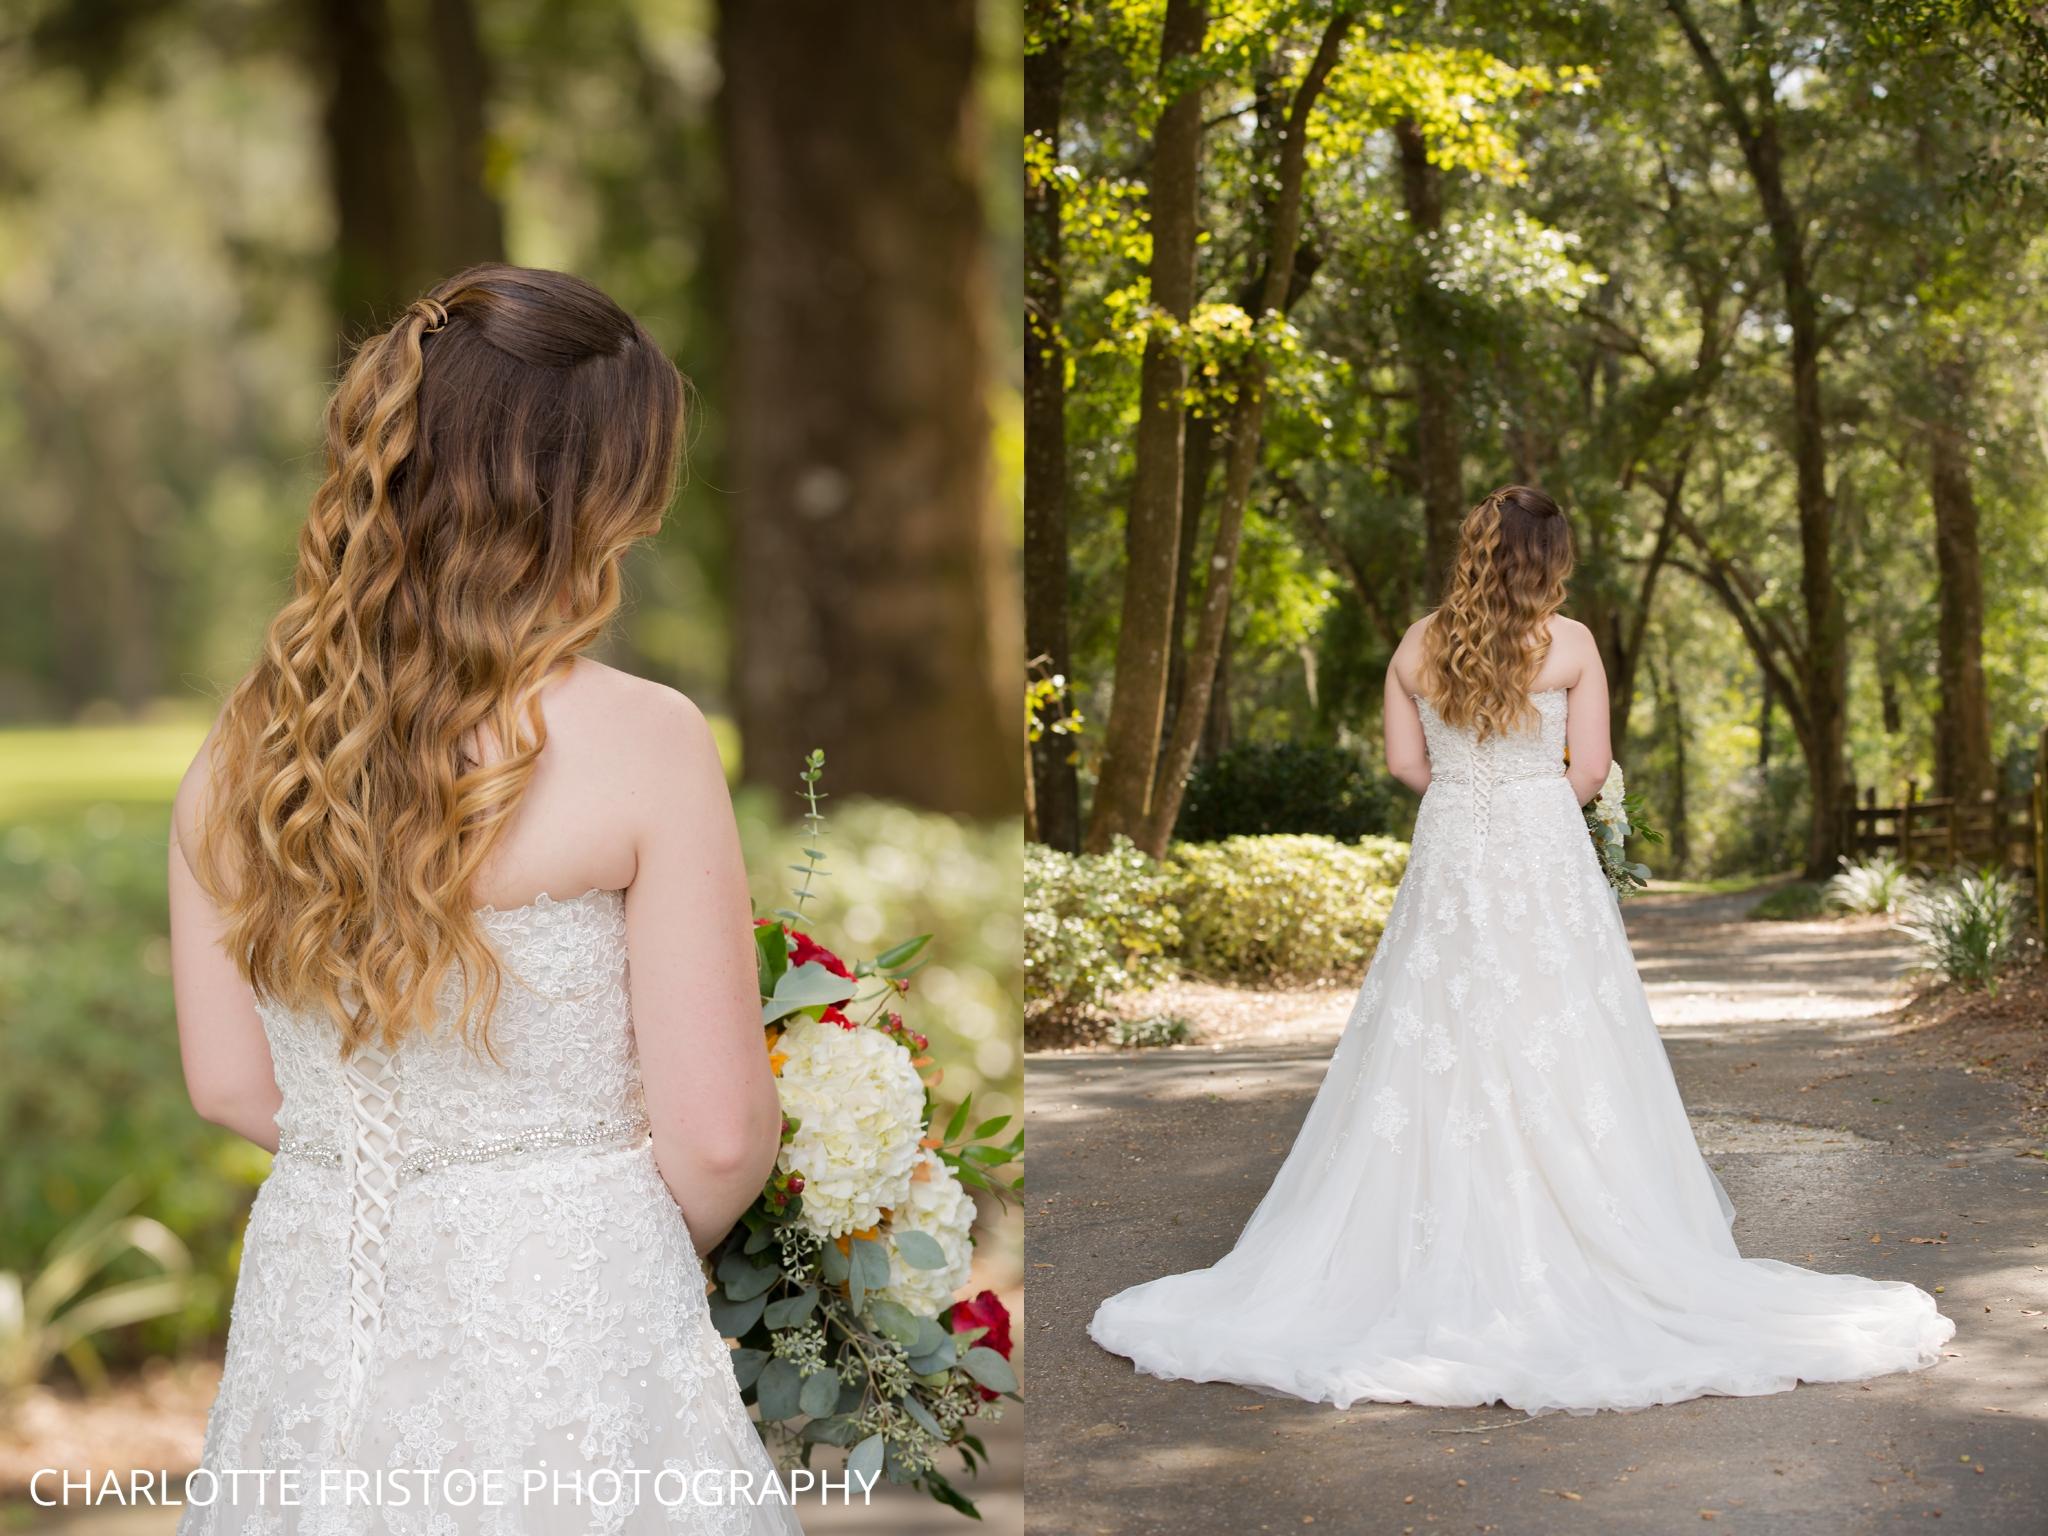 Tallahassee_Wedding_Charlotte_Fristoe-18.jpg